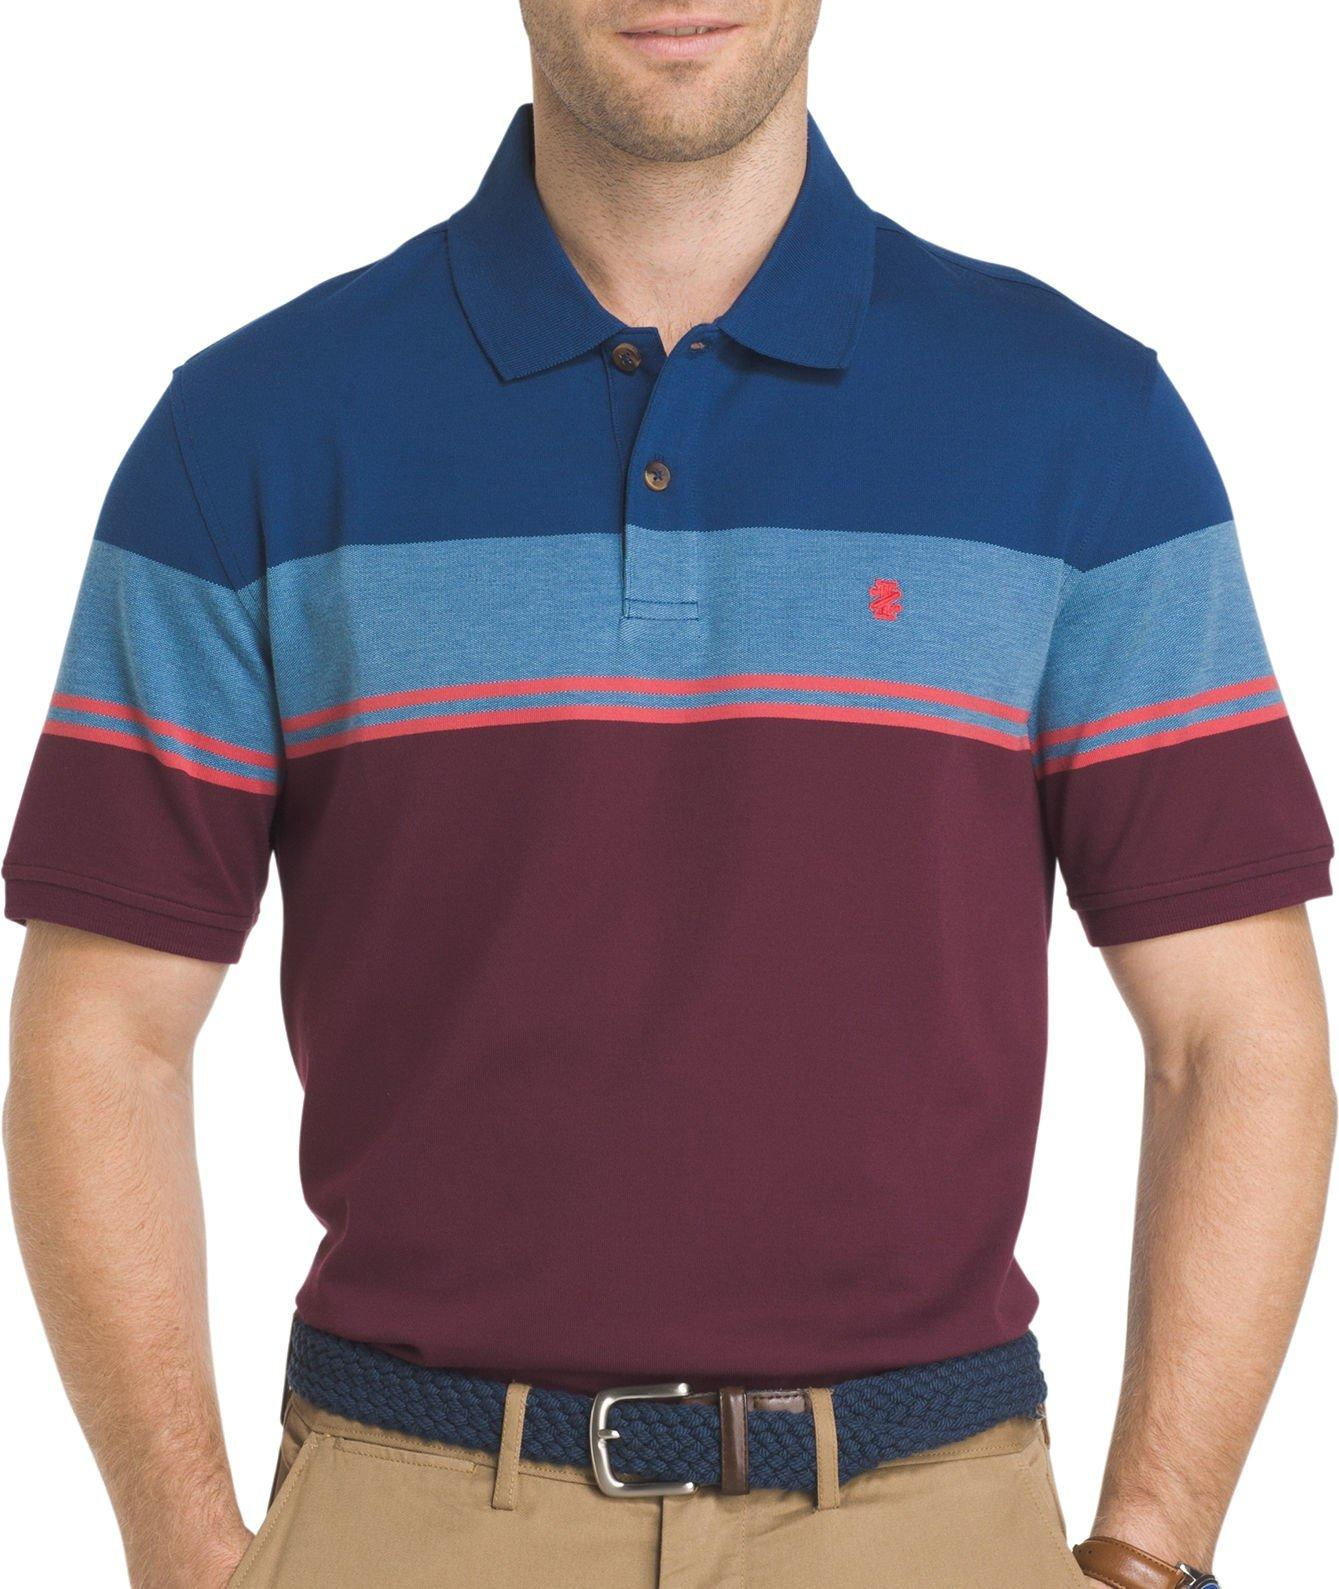 c5fb105f Izod Womens Sleeveless Polo Shirts - DREAMWORKS